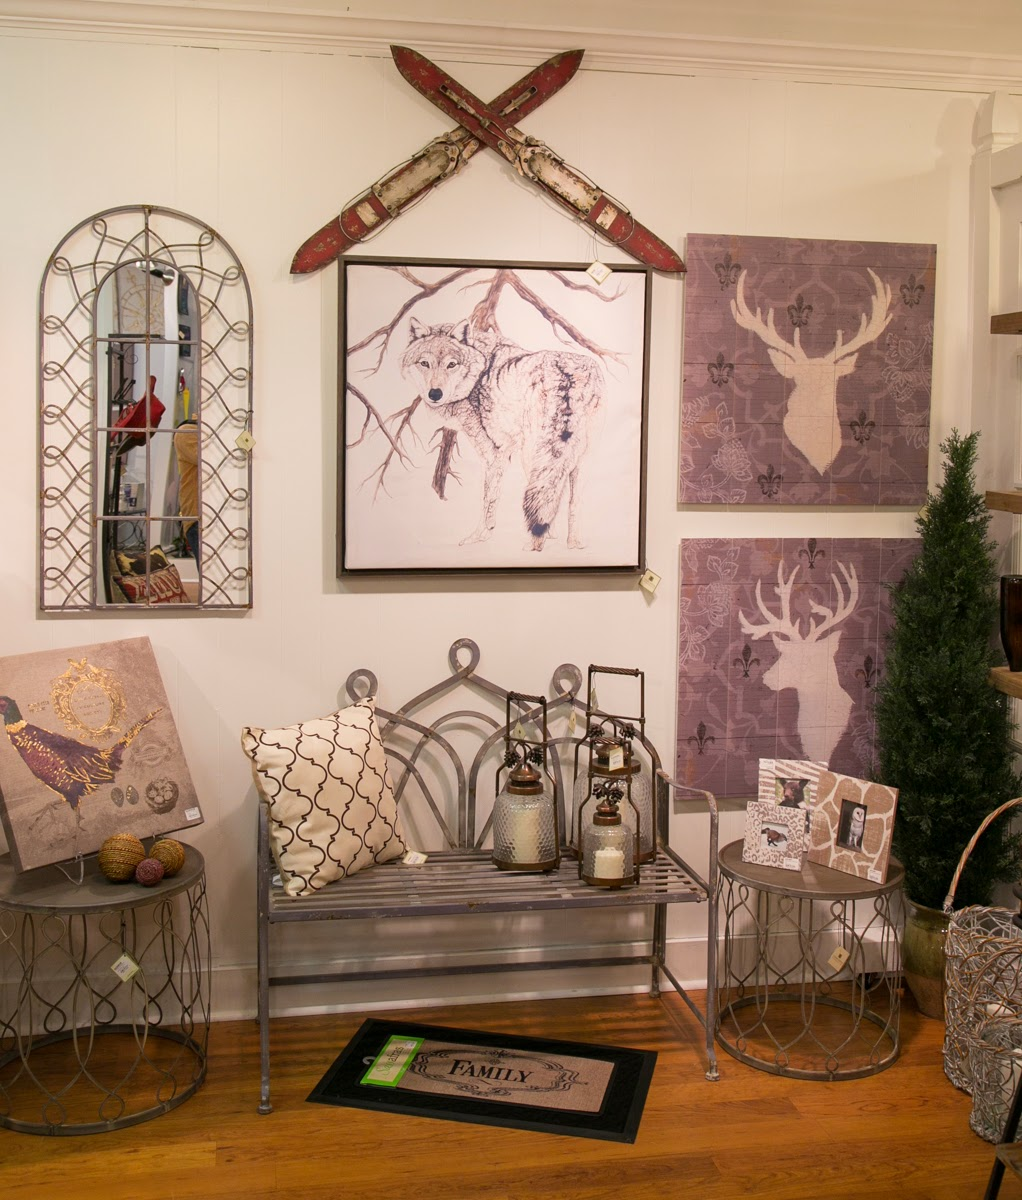 evergreen enterprises cape craftsmen home decor highlights